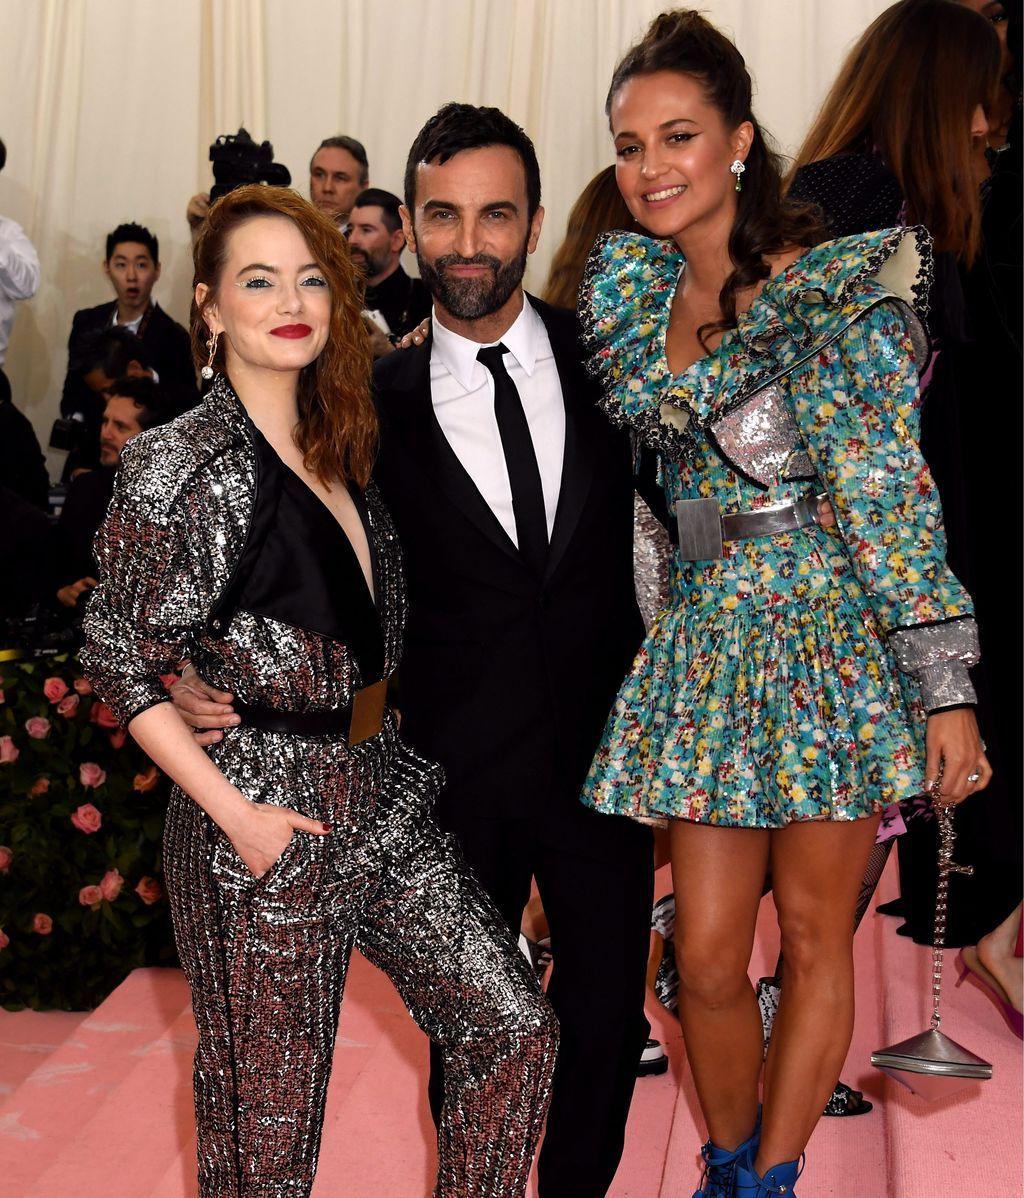 Emma Stone and Alicia Vikander junto a Riccardo Tisci, director creativo de Burberry